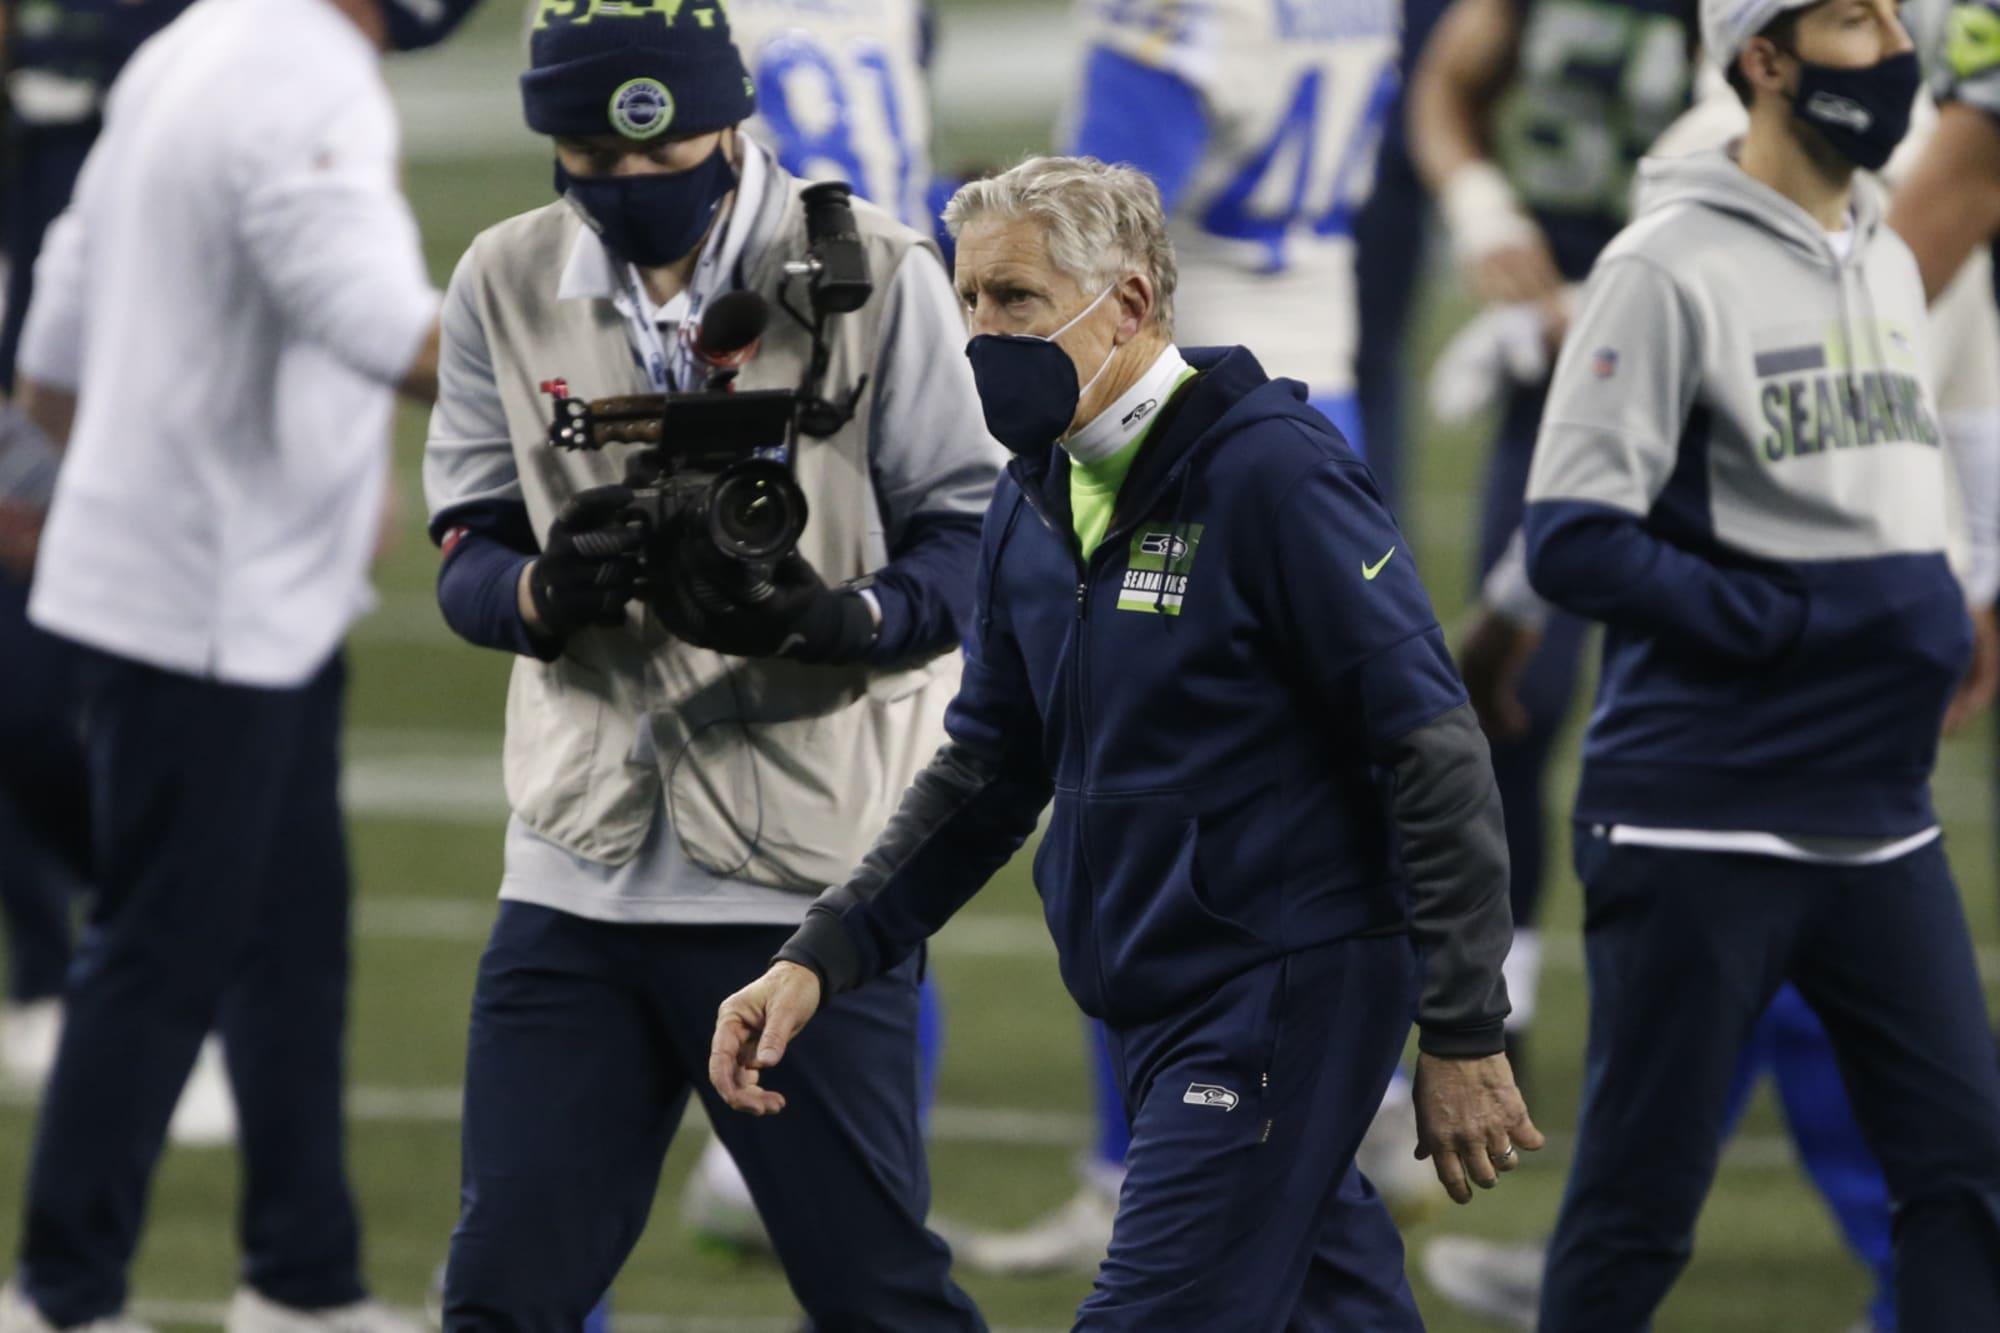 Seahawks land Russell Wilson a new bodyguard in 2021 NFL Mock Draft